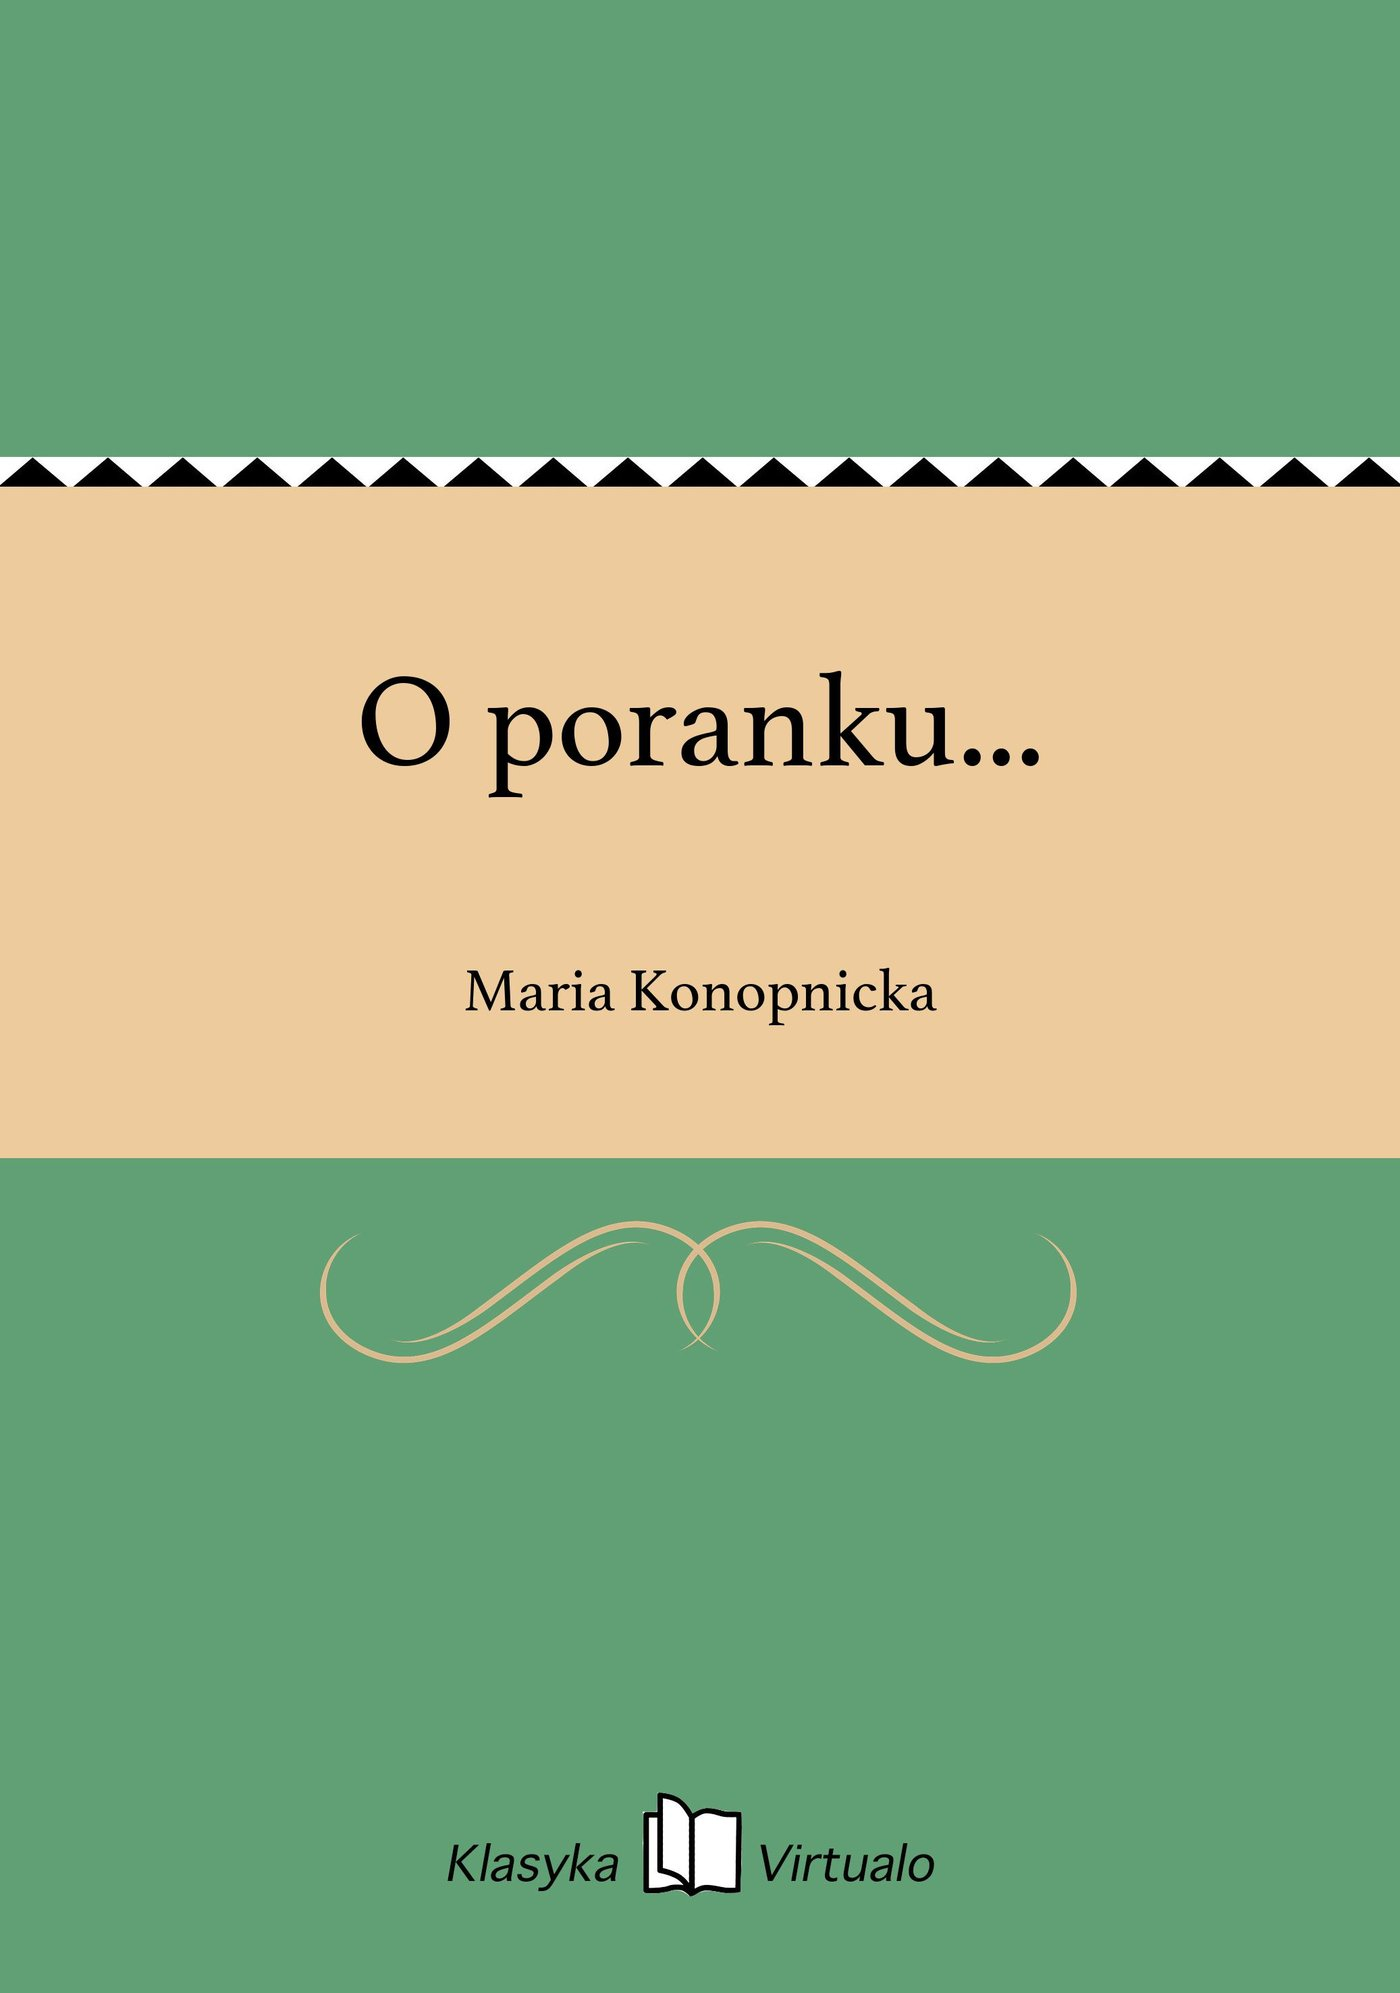 O poranku... - Ebook (Książka EPUB) do pobrania w formacie EPUB